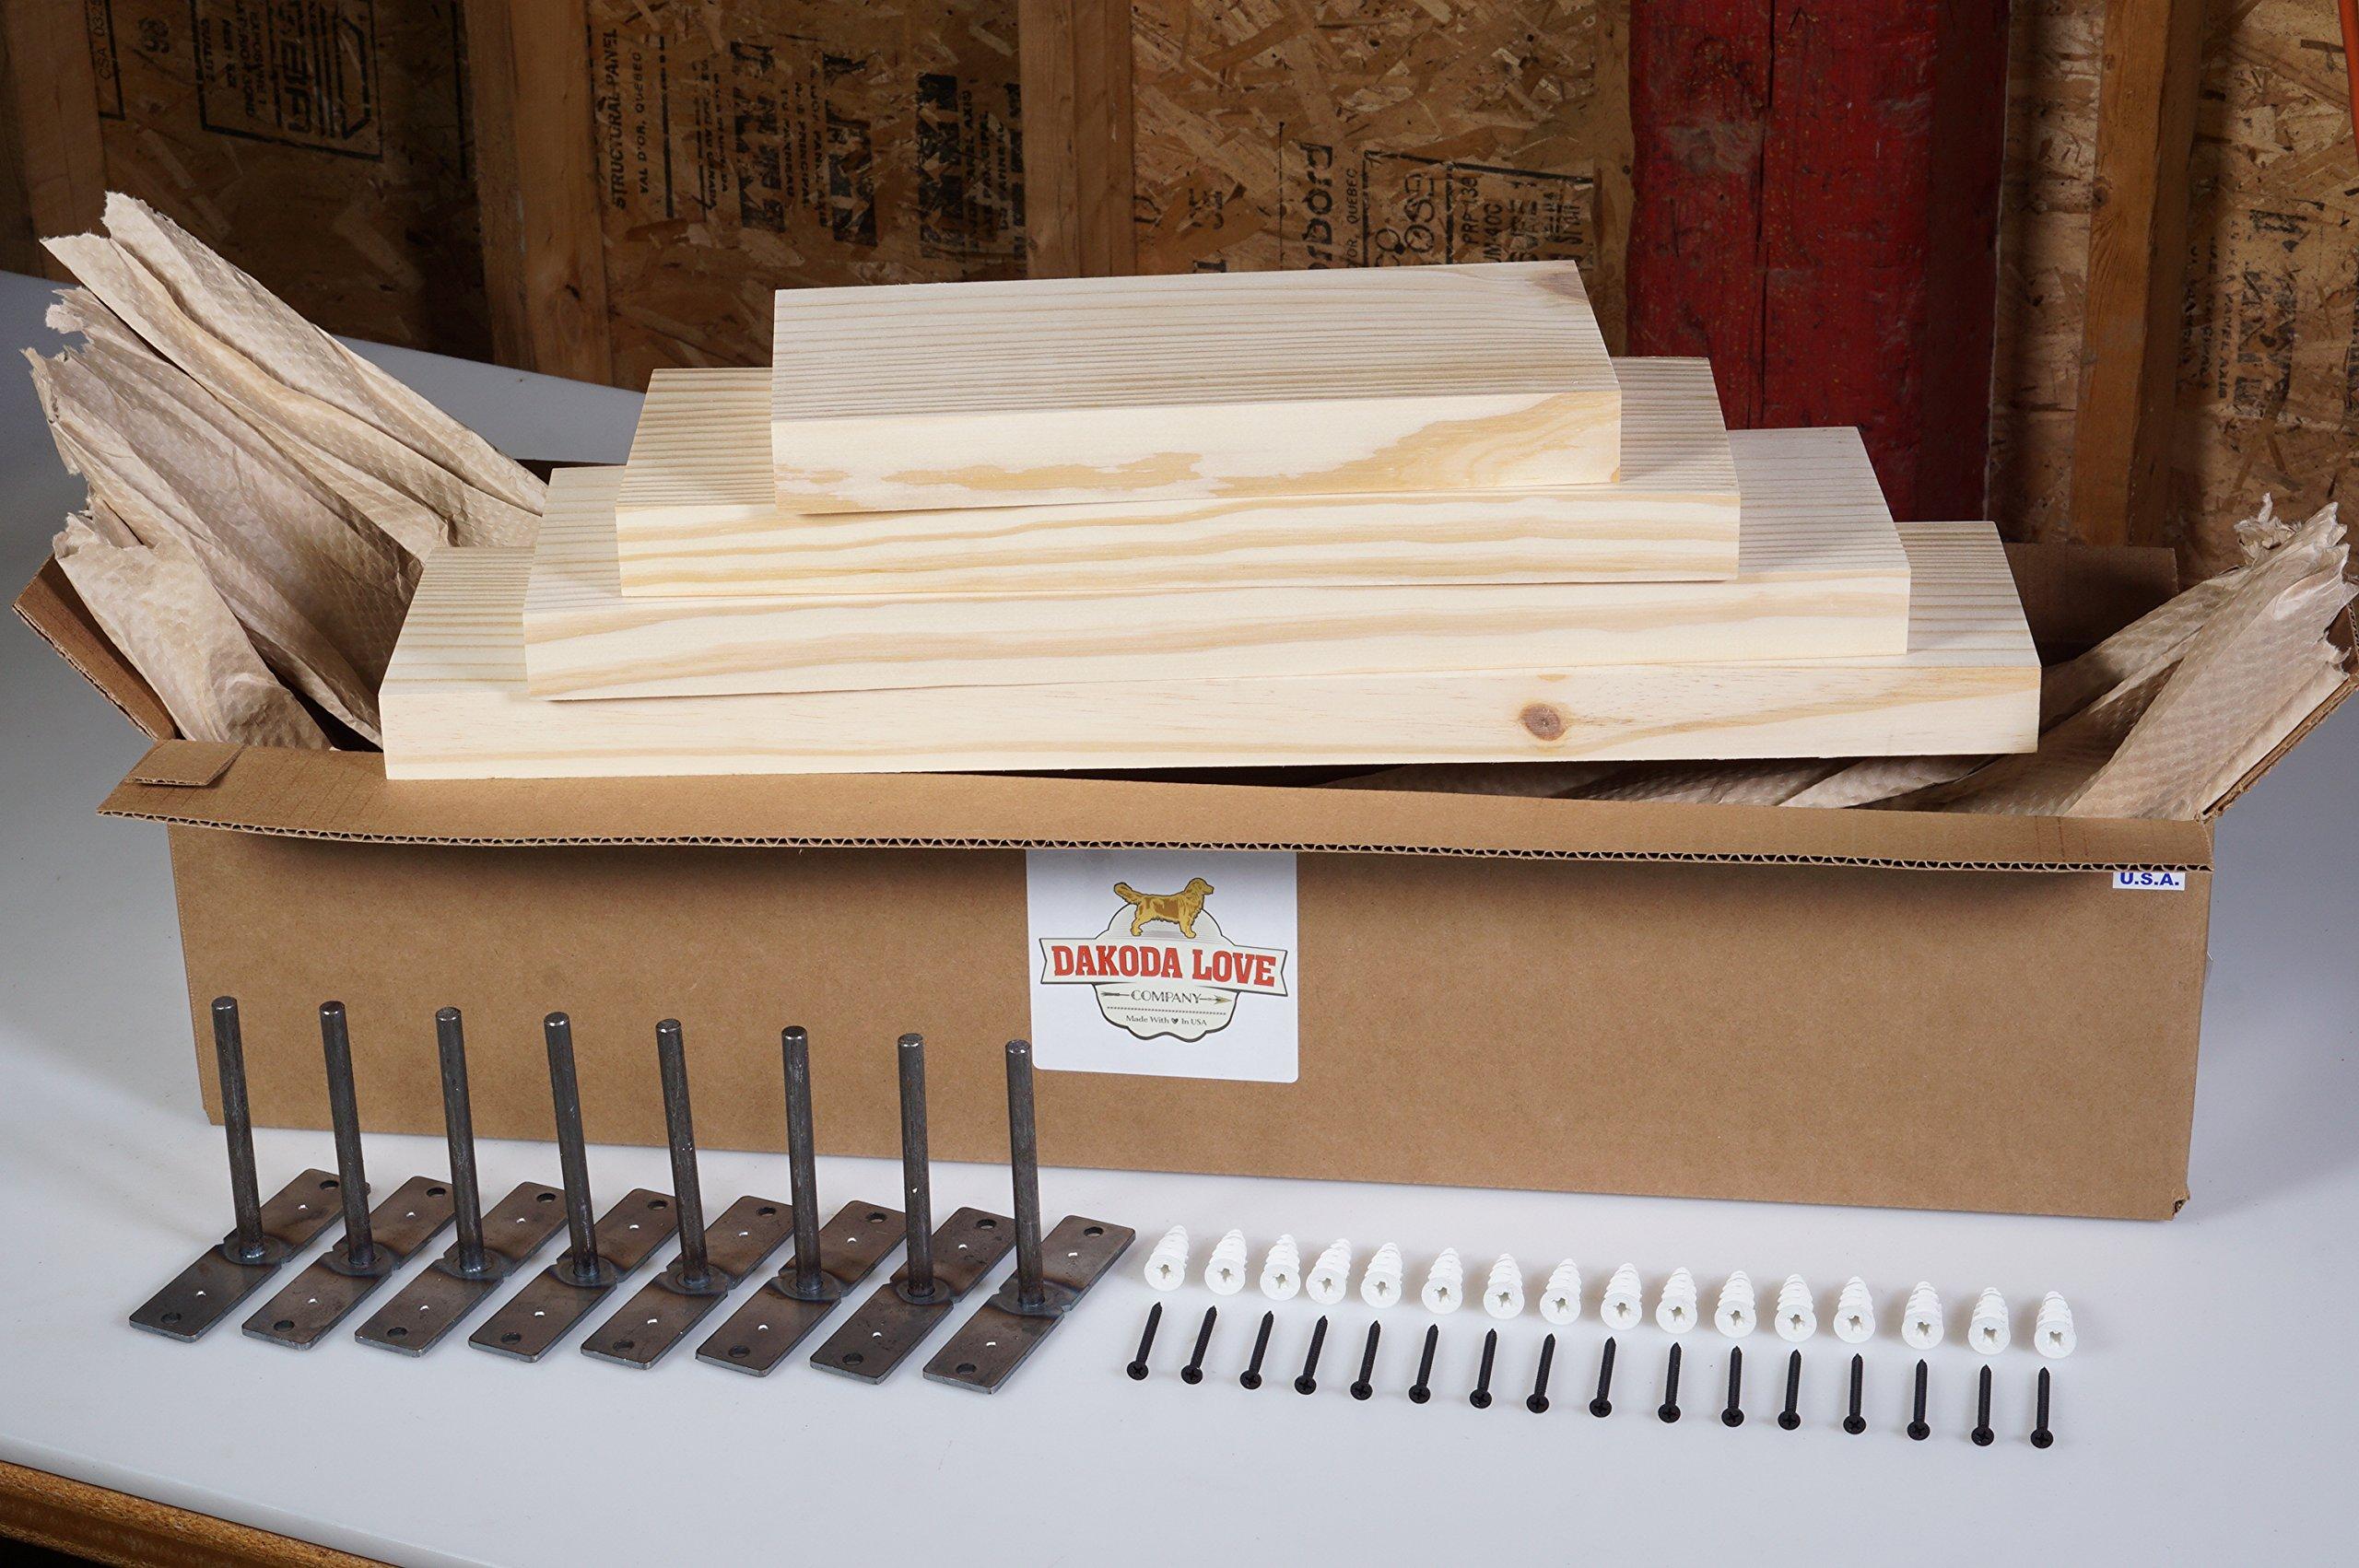 DAKODA LOVE Clean Edge Floating Shelves, USA Handmade, Unfinished Ready to Stain, 100% Countersunk Hidden Floating Shelf Brackets, Beautiful Grain Pine Wood Wall Decor (Set of 4) (Unfinished)